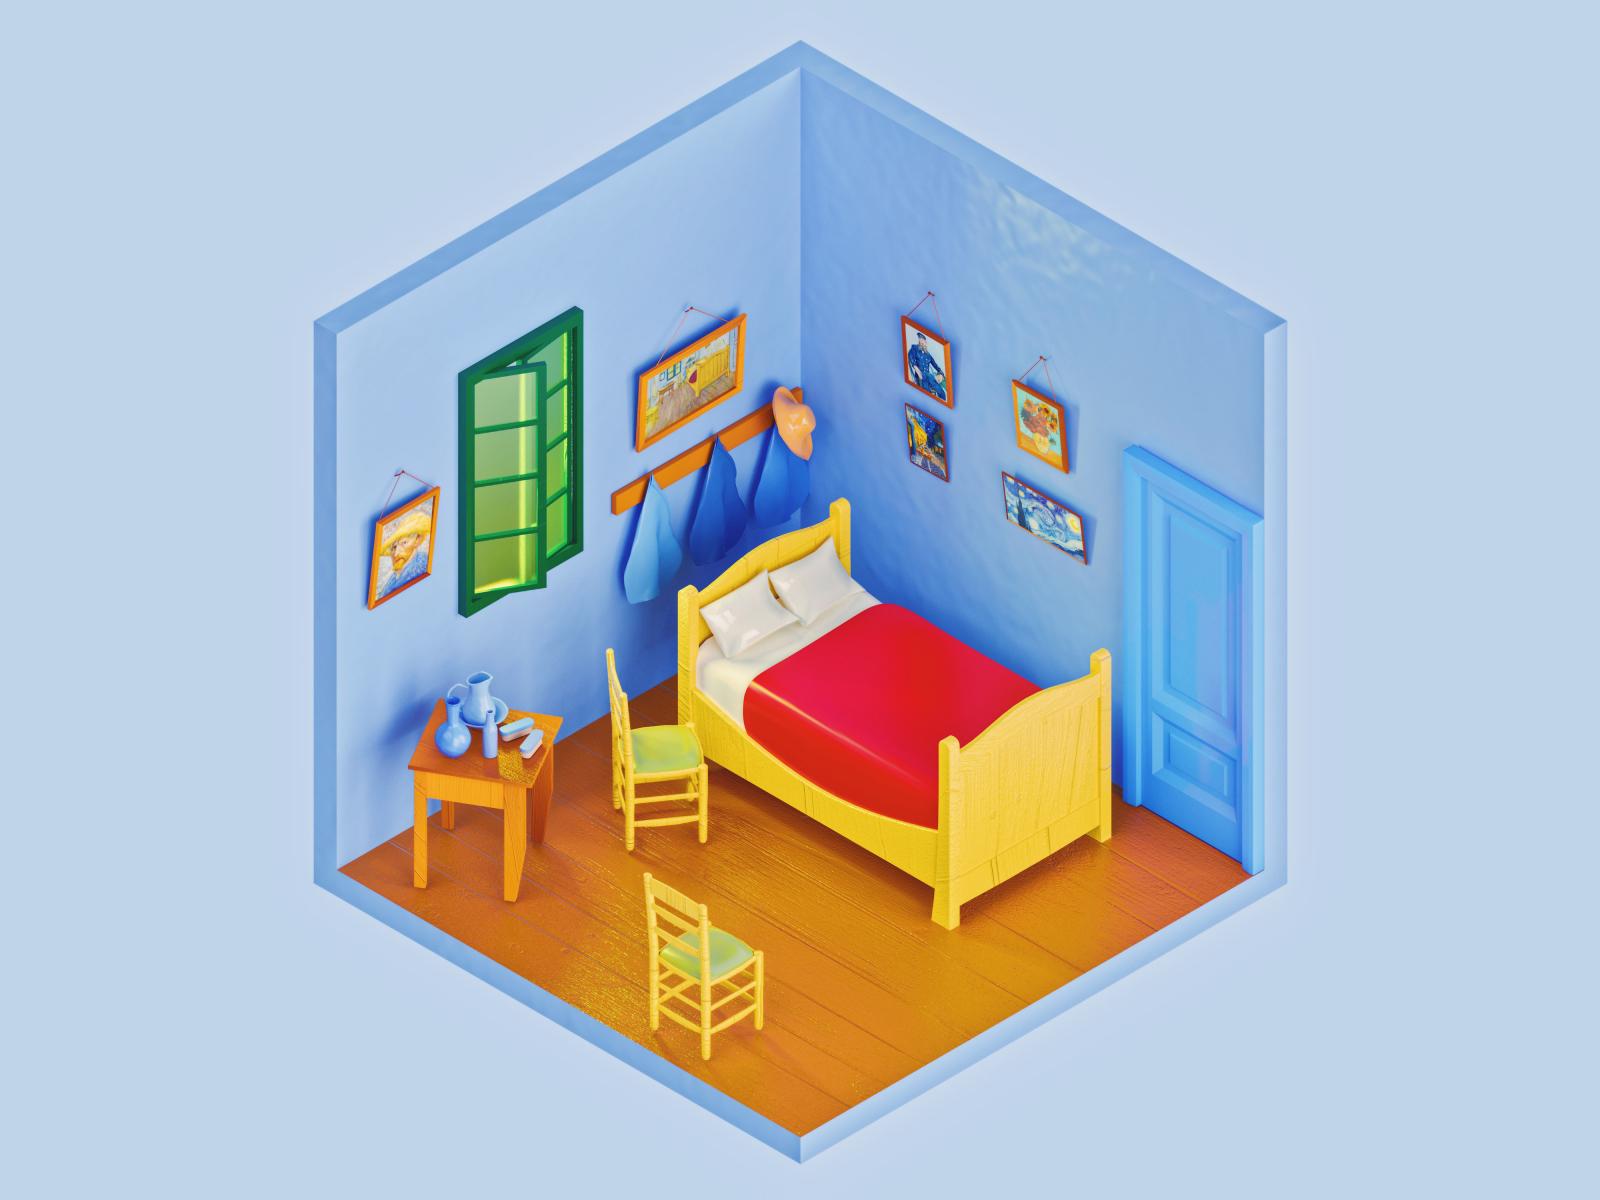 Vincent Van Gogh S Bedroom In Arles By Amrit Pal Singh On Dribbble,Kitchen Garden Window Shelf